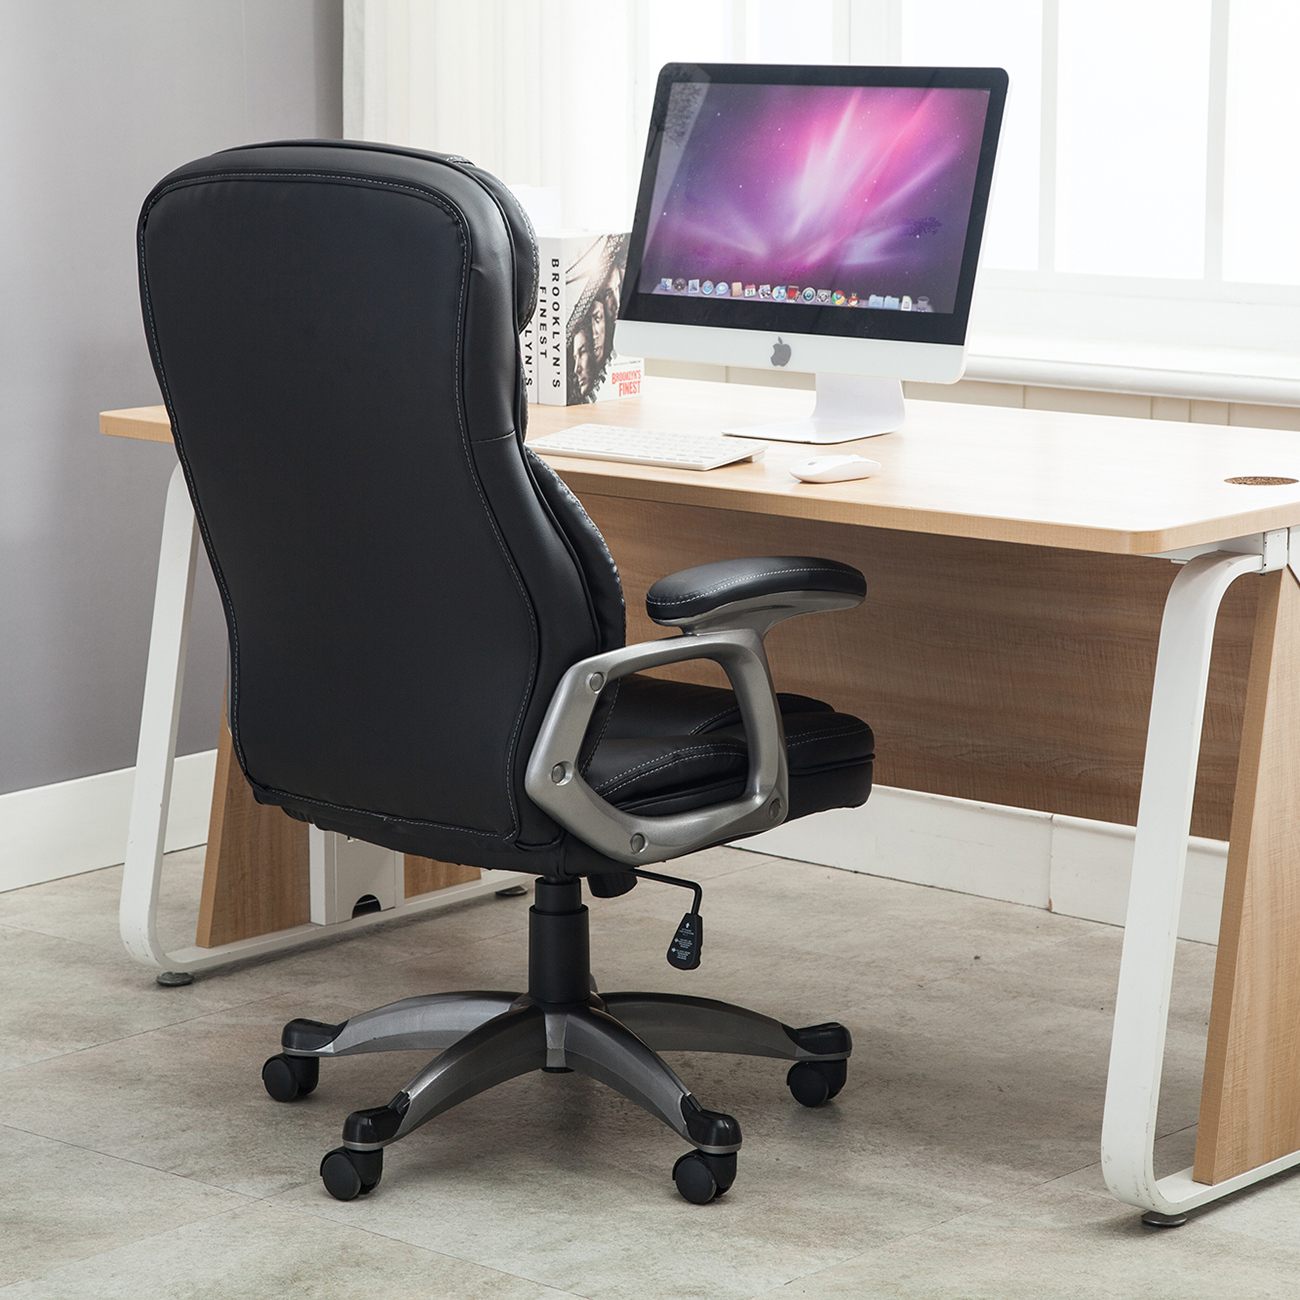 ergonomic chair tilt chalk paint table and ideas executive office pu leather high back desk